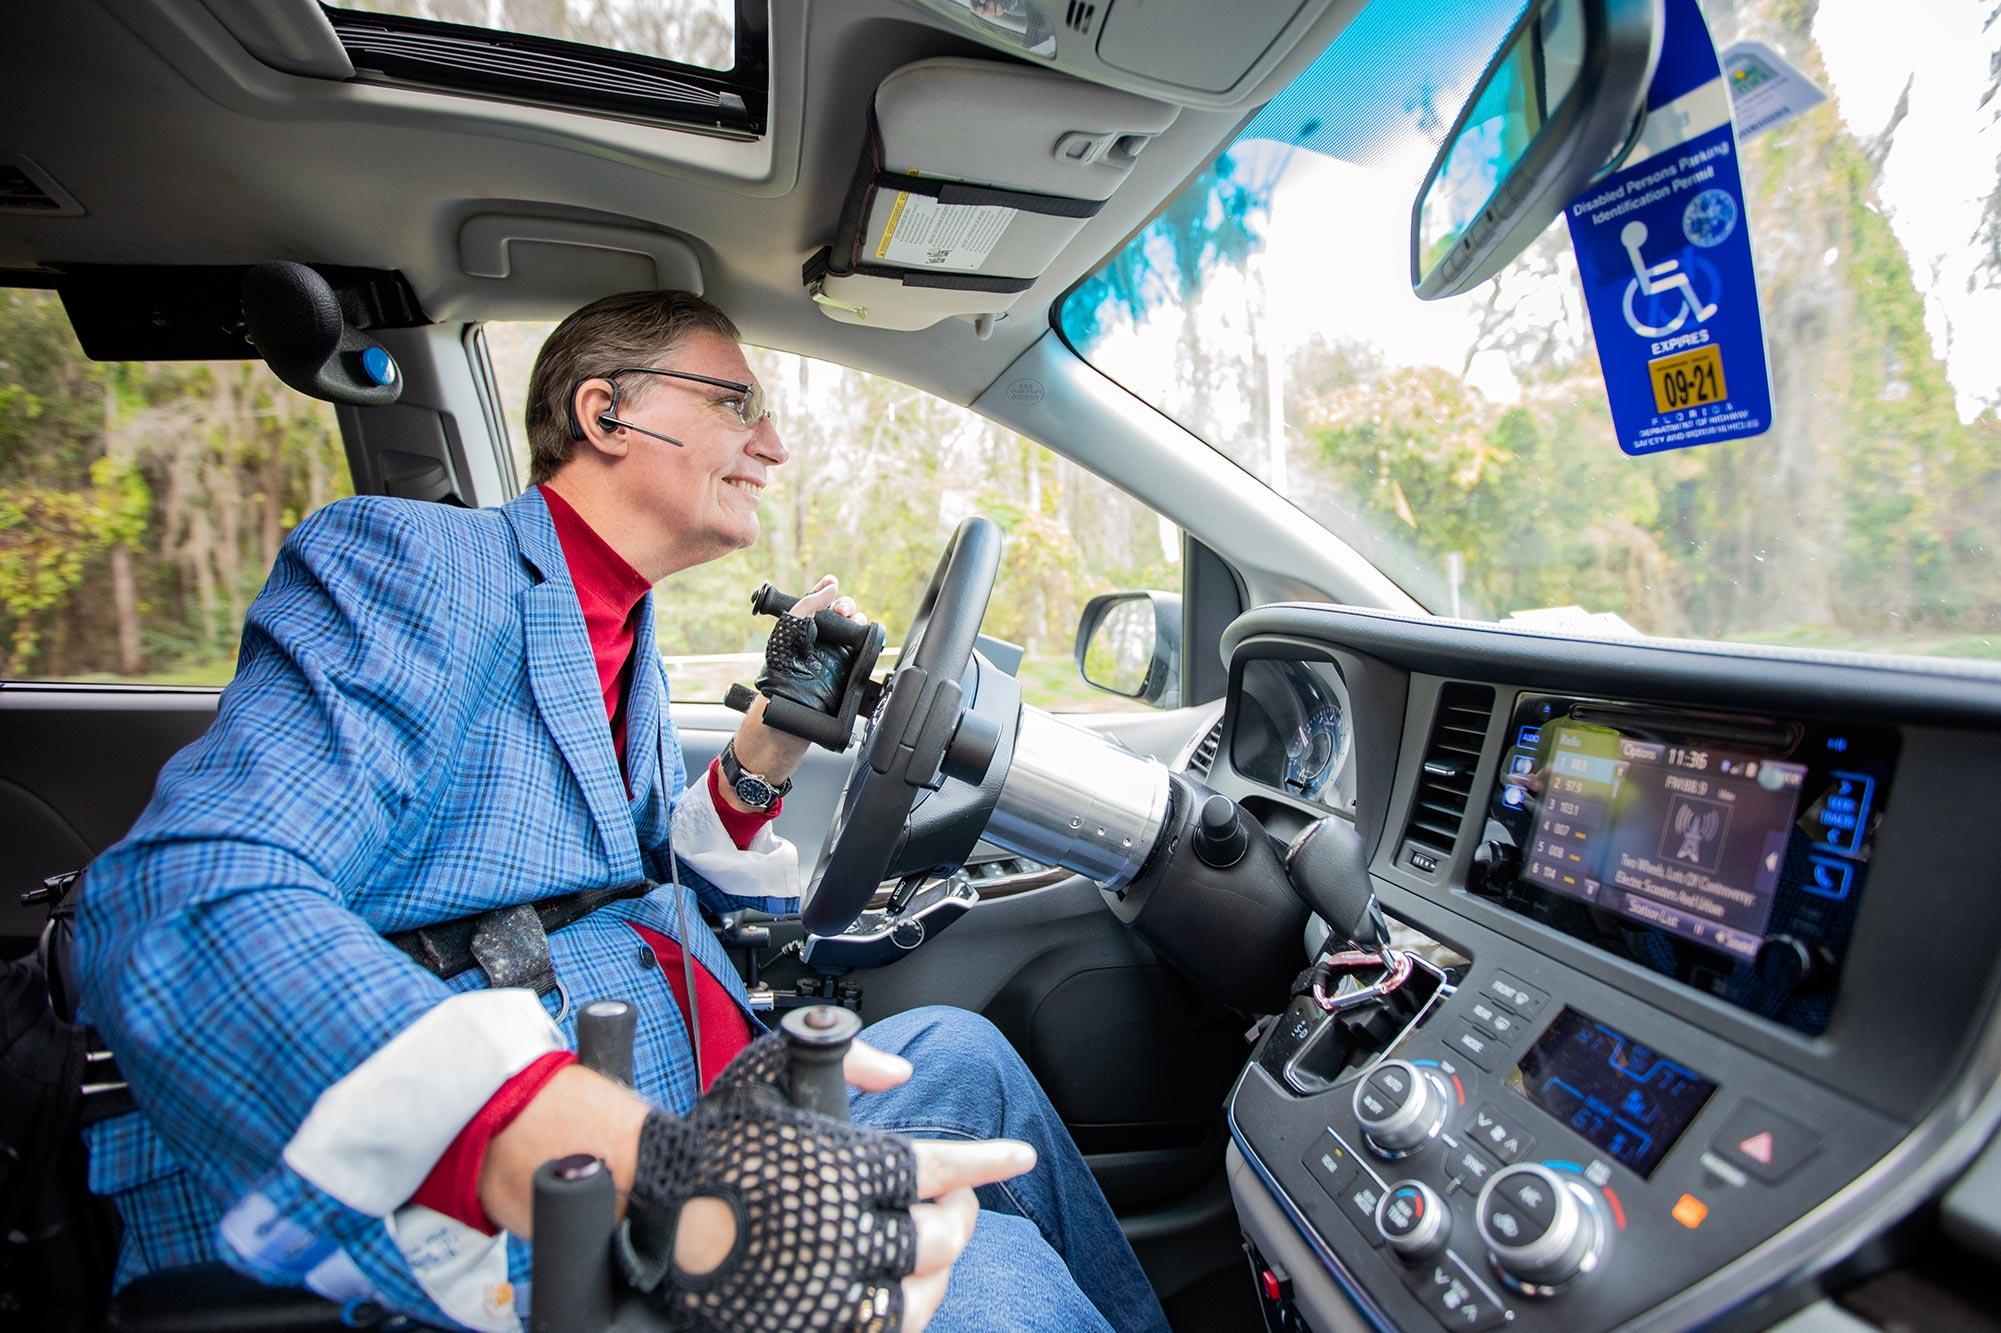 JR Harding driving accessible car